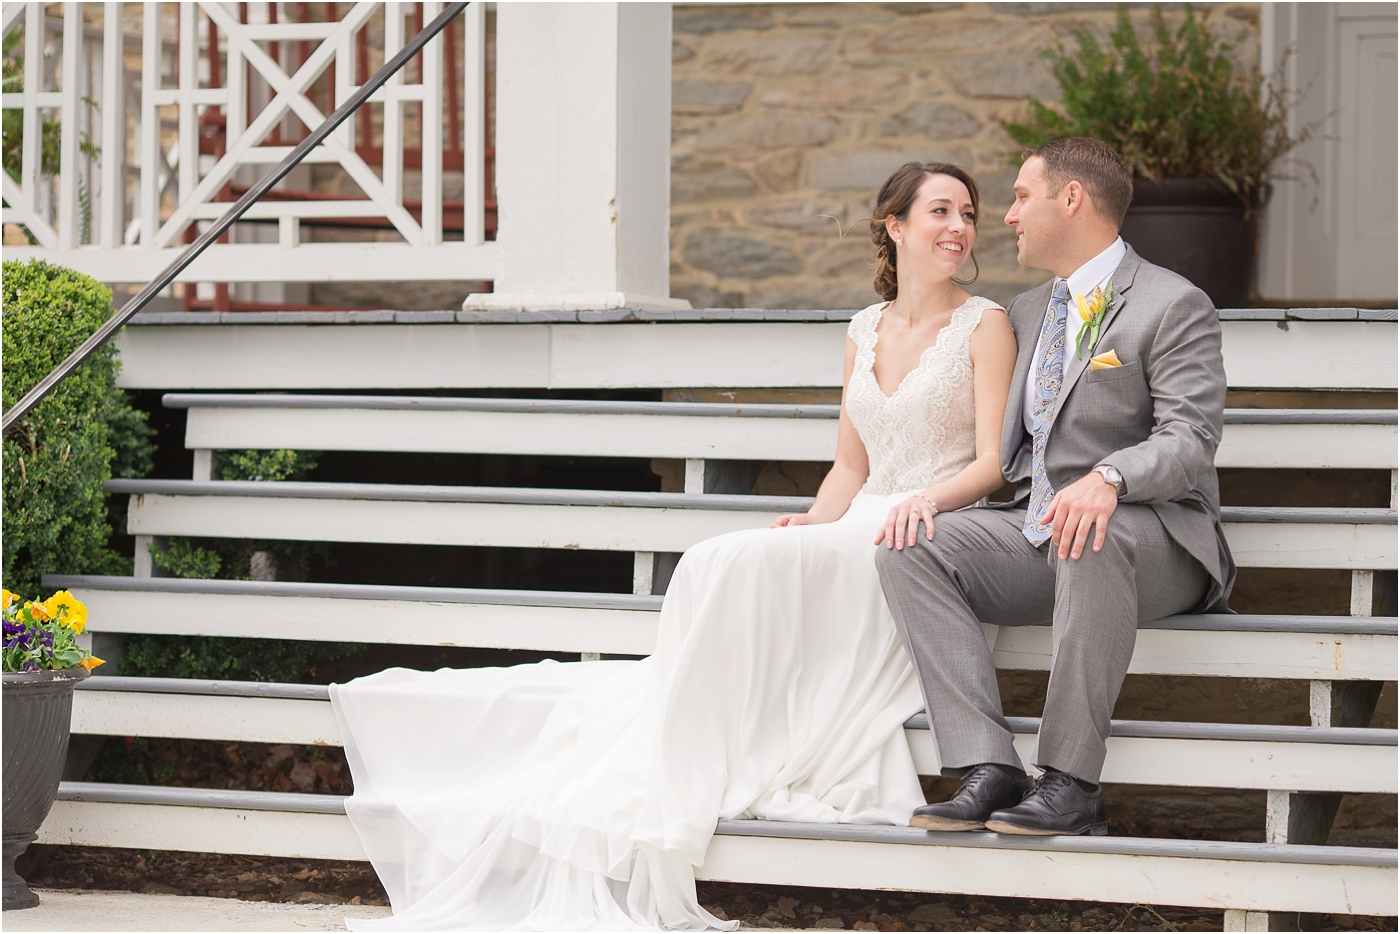 Springfield-manor-winery-wedding-59.jpg